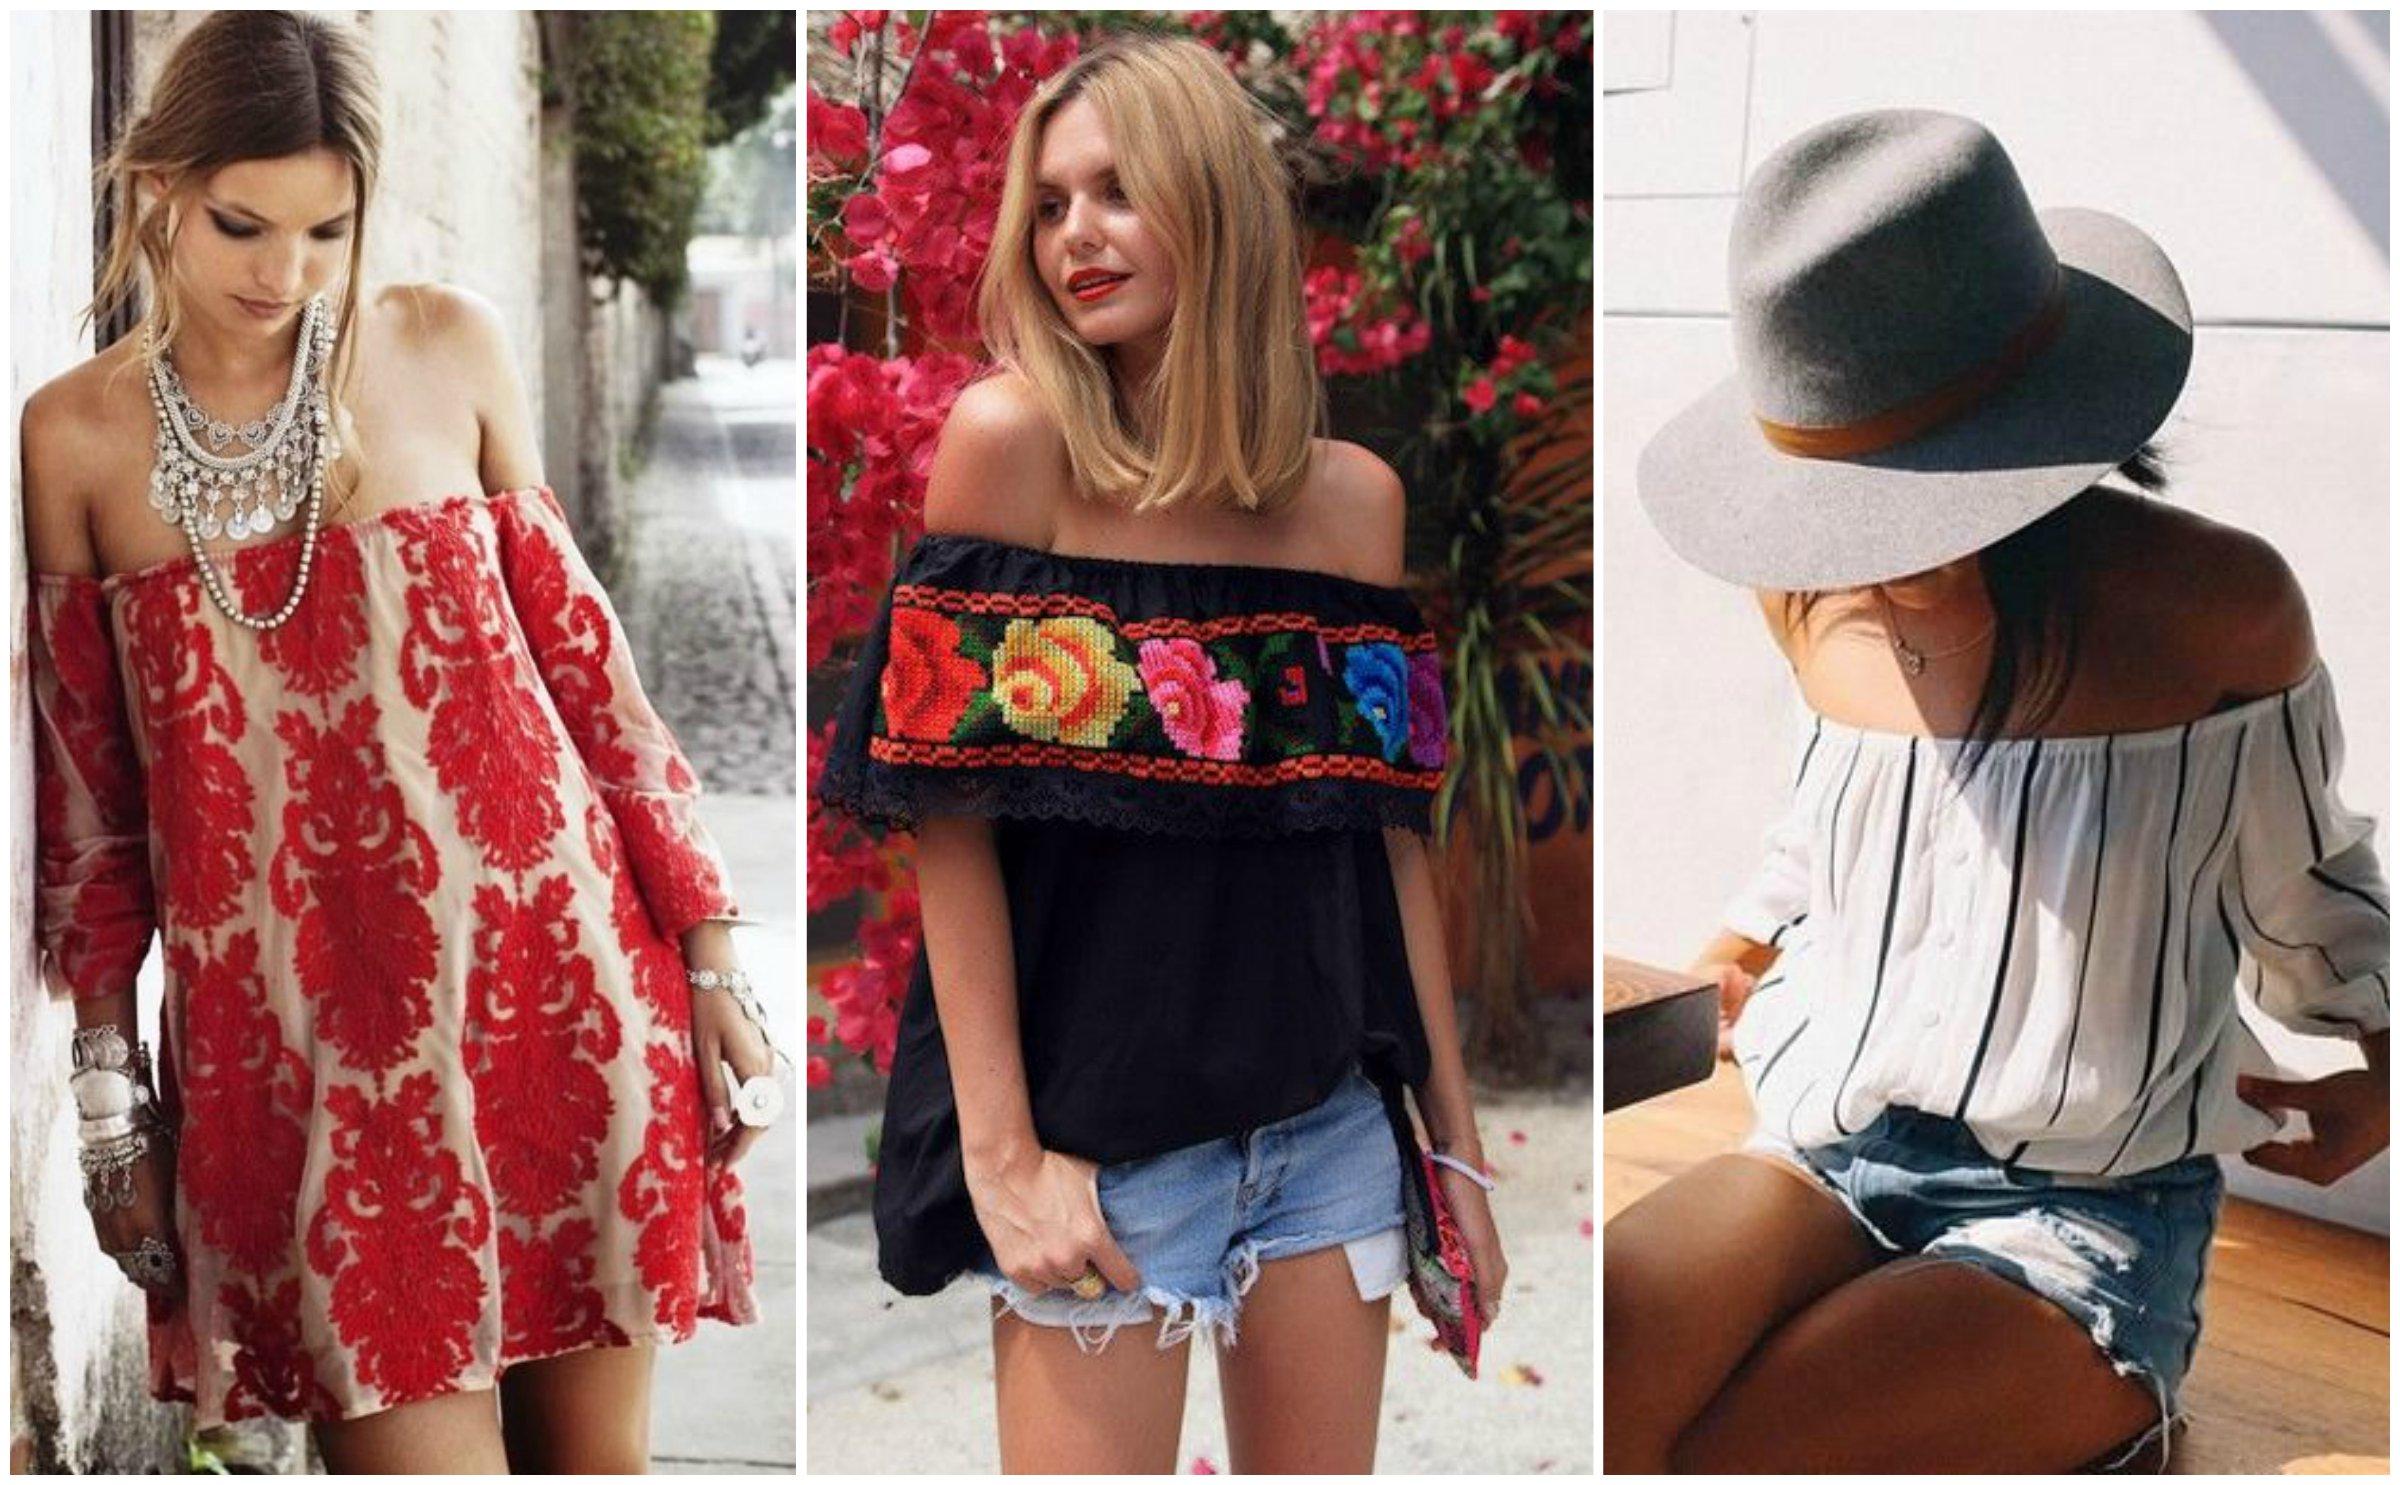 Tavaszi trendek 2015